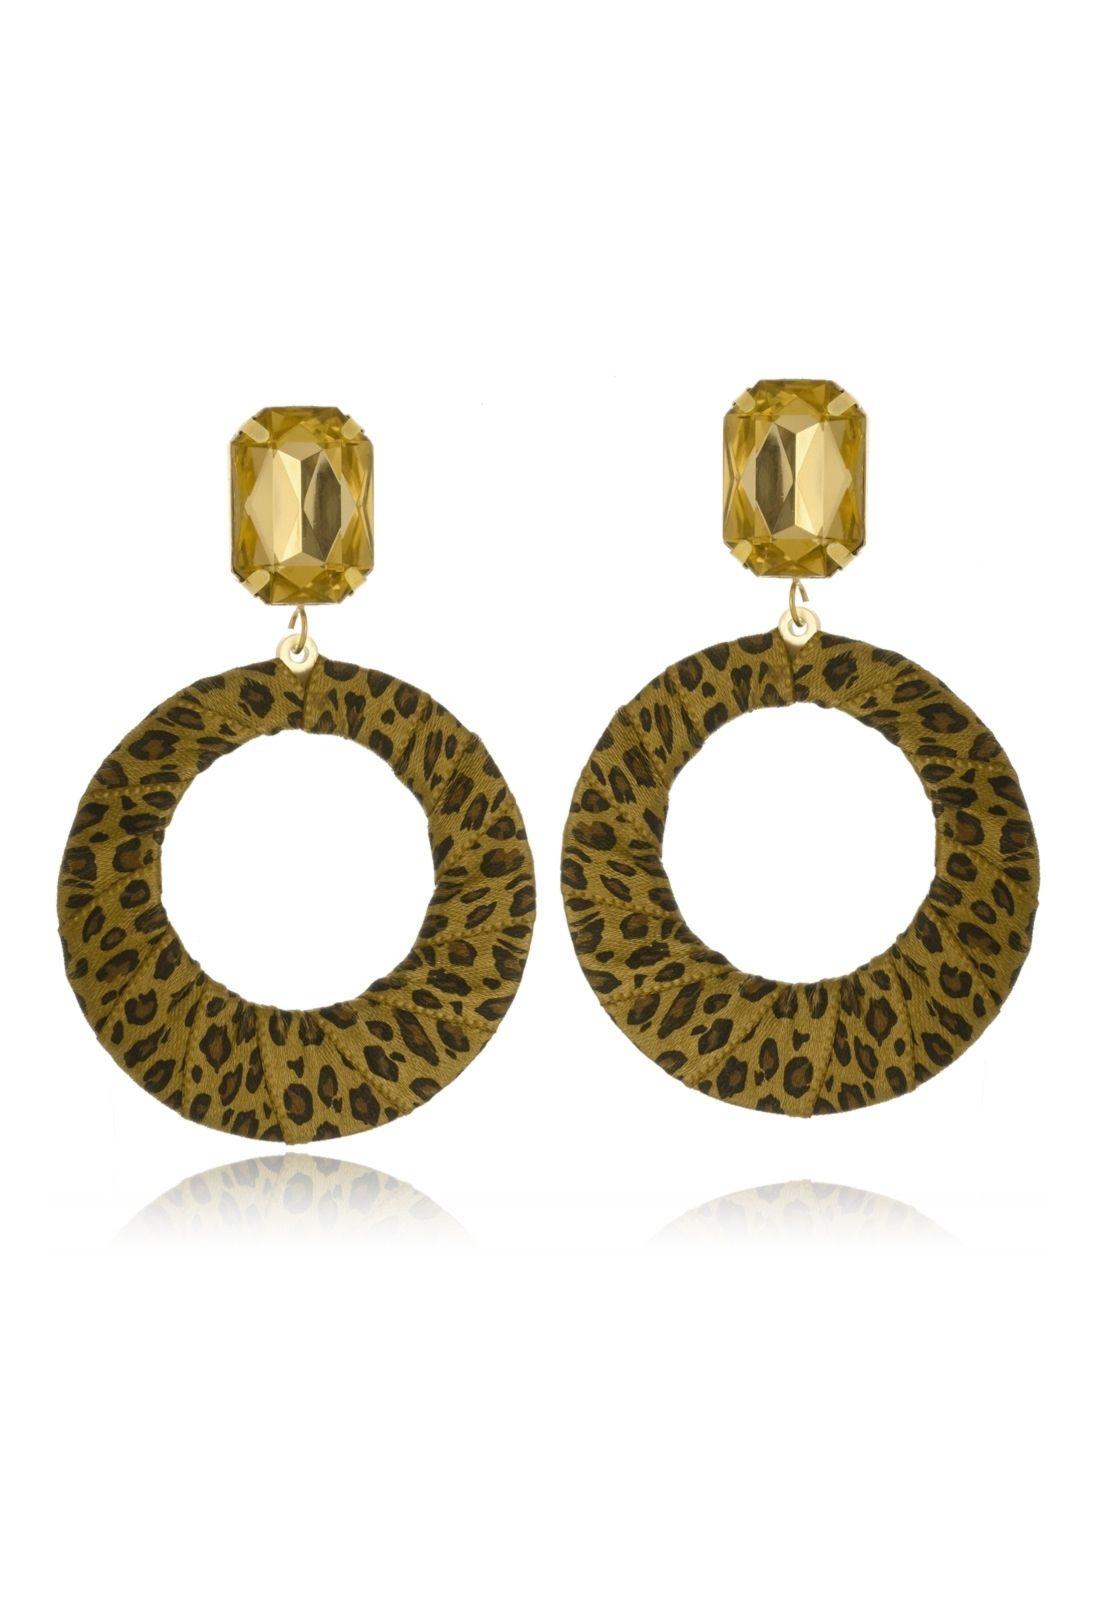 Brinco Le Diamond Geométrico Animal Print Dourado